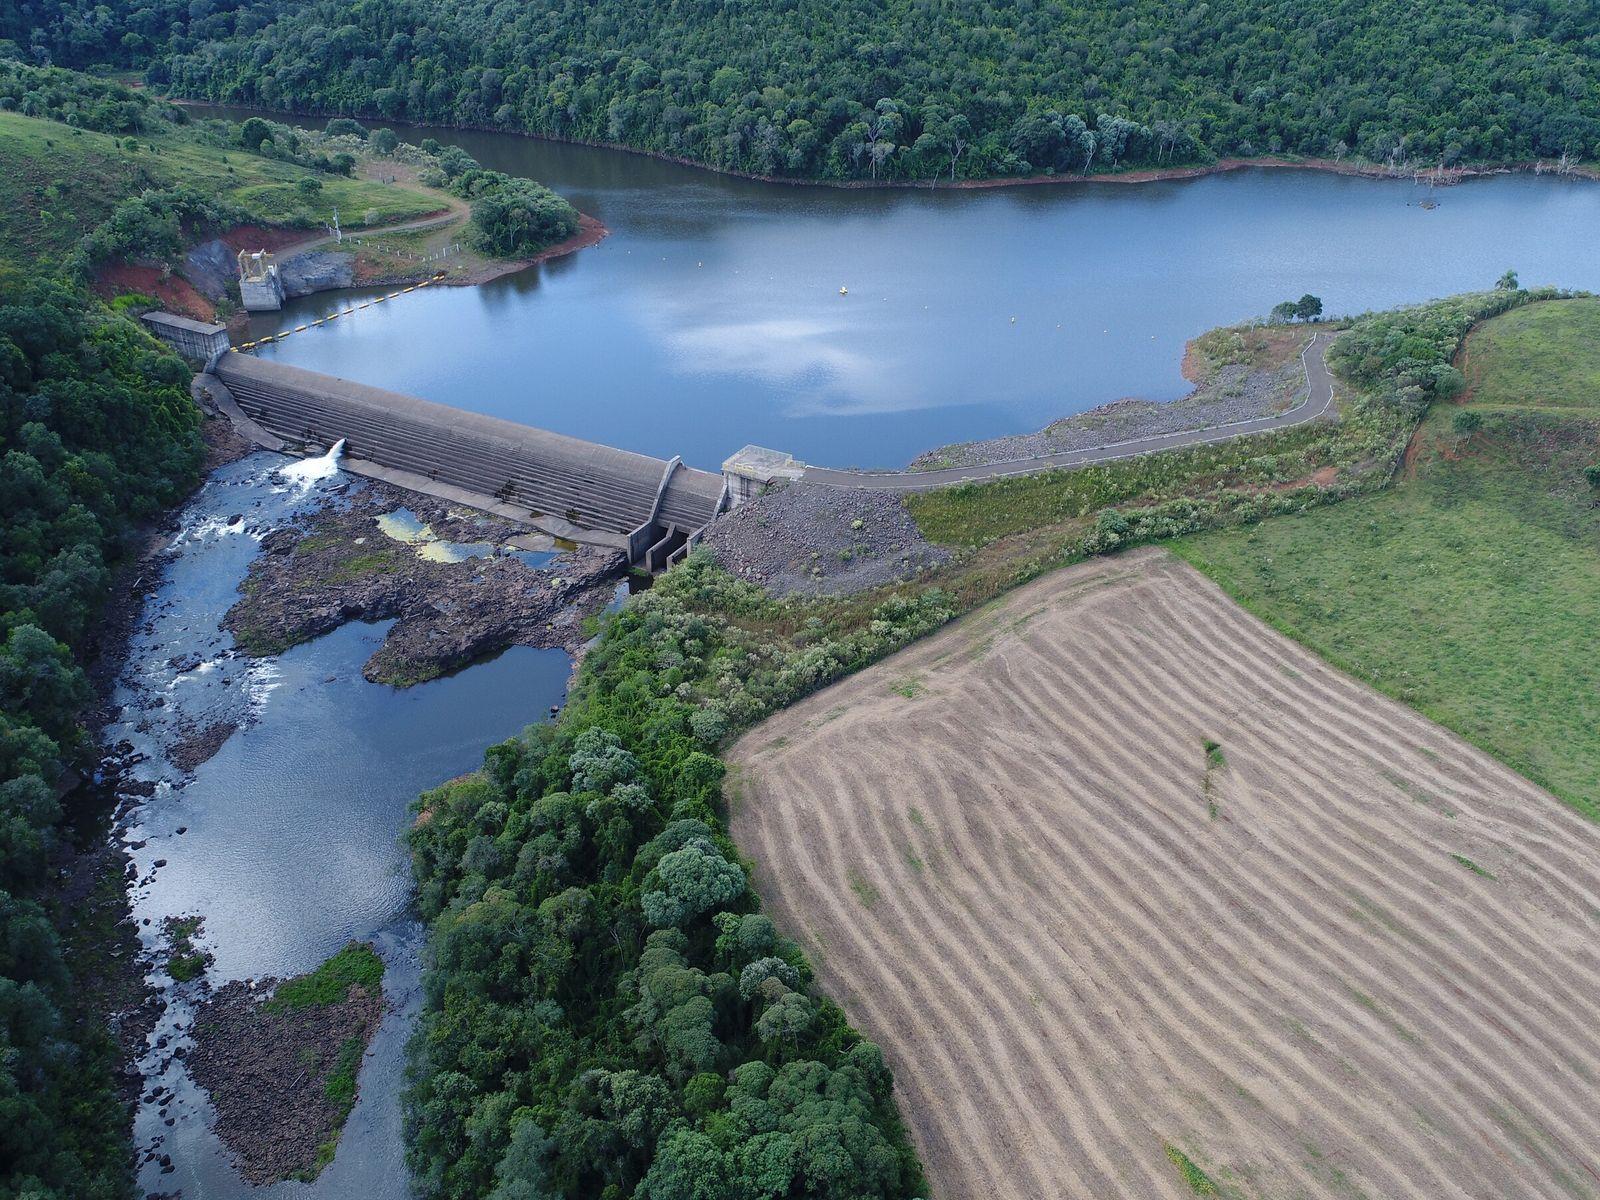 foto aérea de pequena central hidrelétrica no rio grande do sul